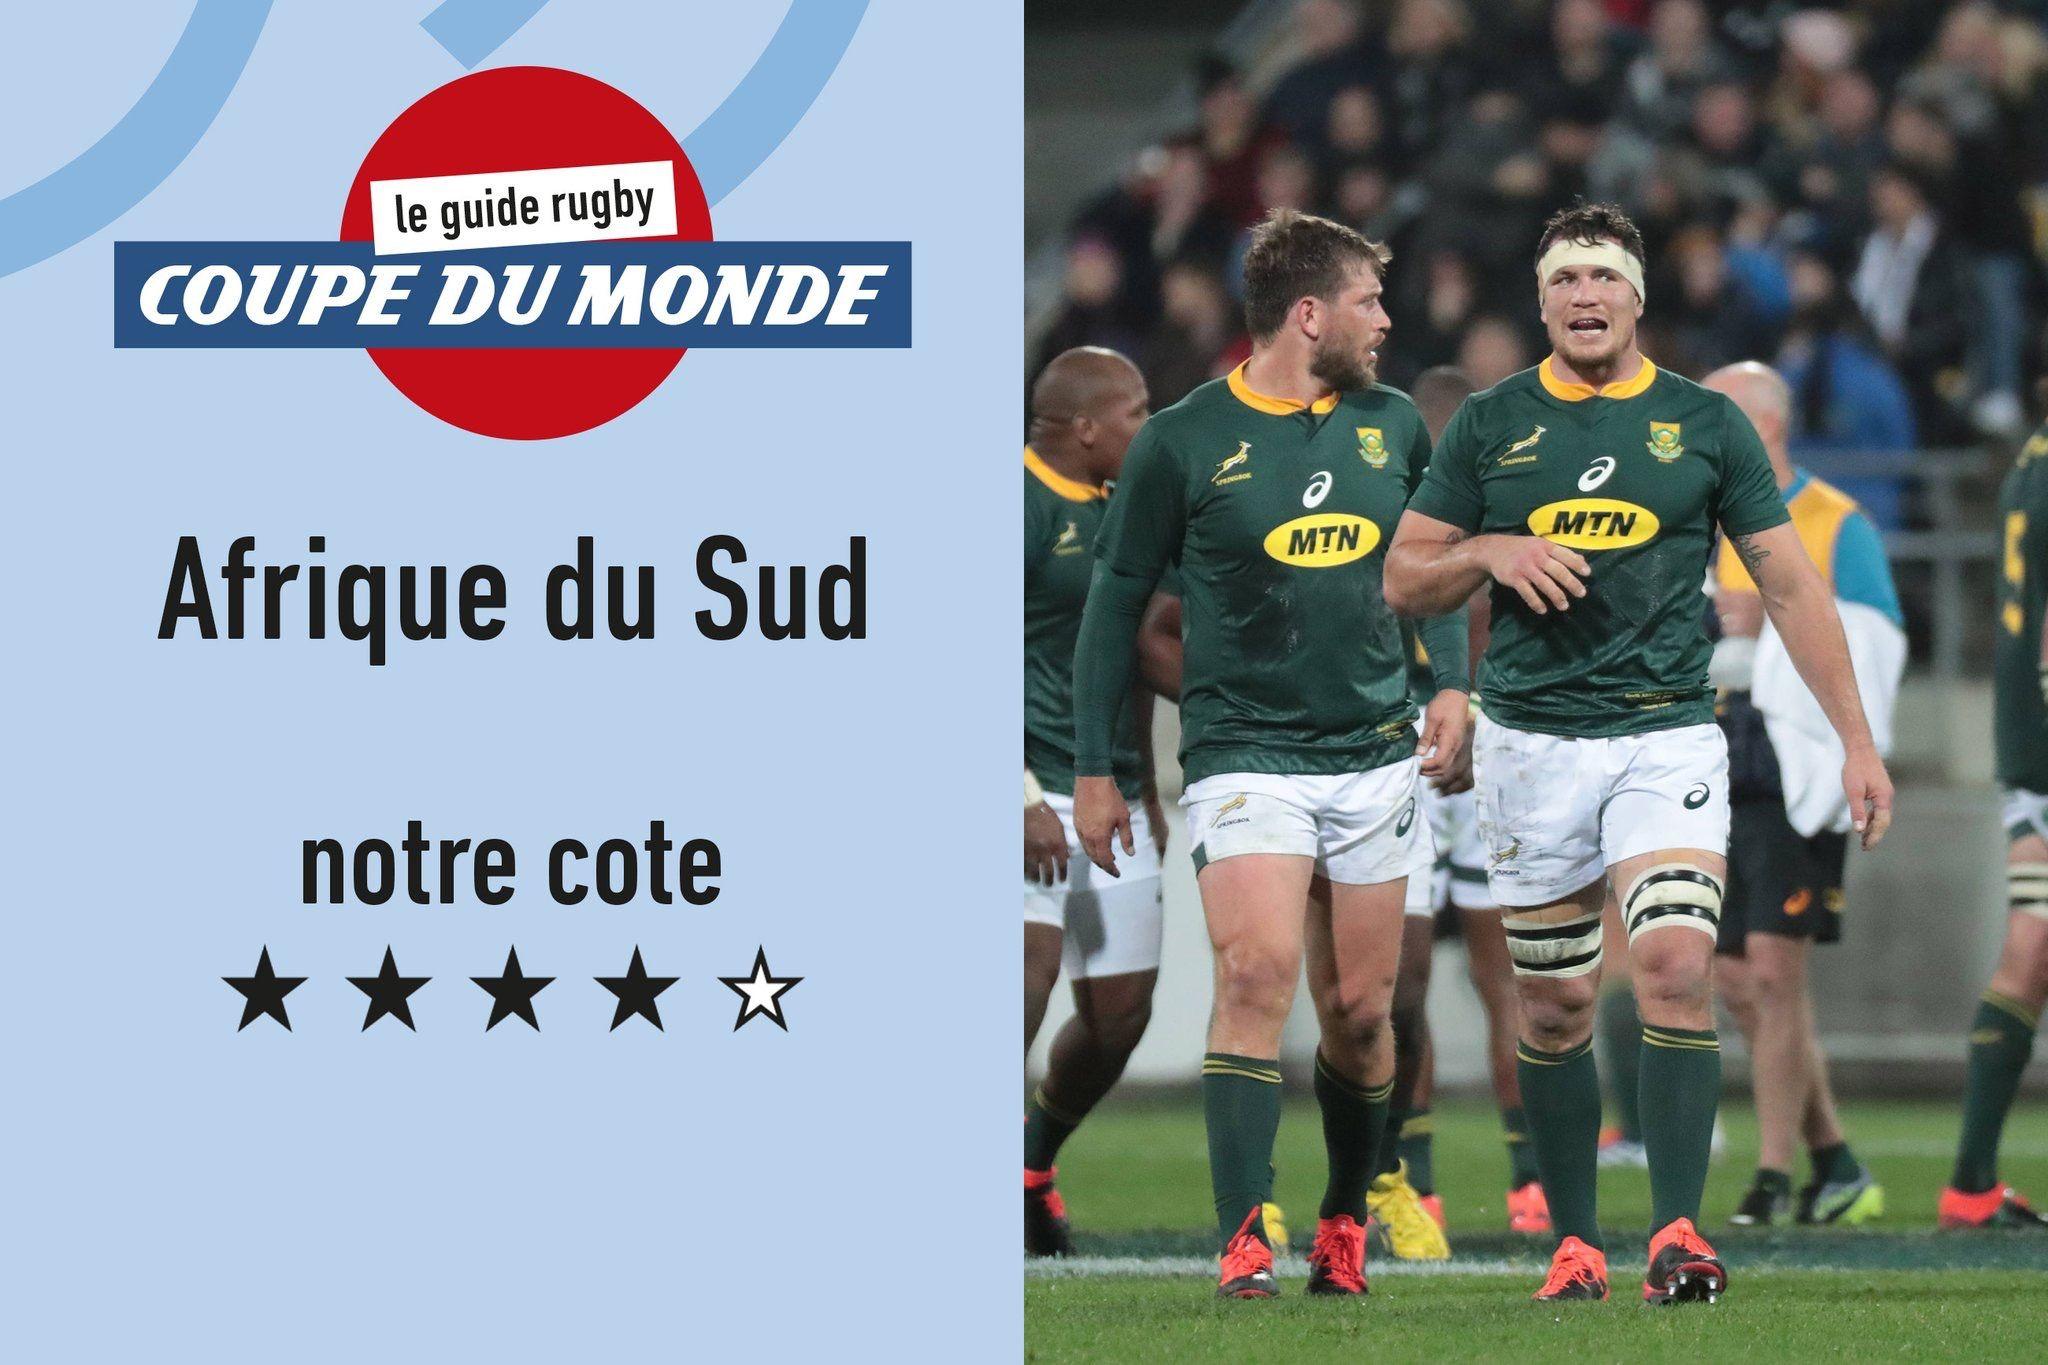 Rugby Worldcup Japan 2019 Afriquedusud Afrique Du Sud Et Afrique